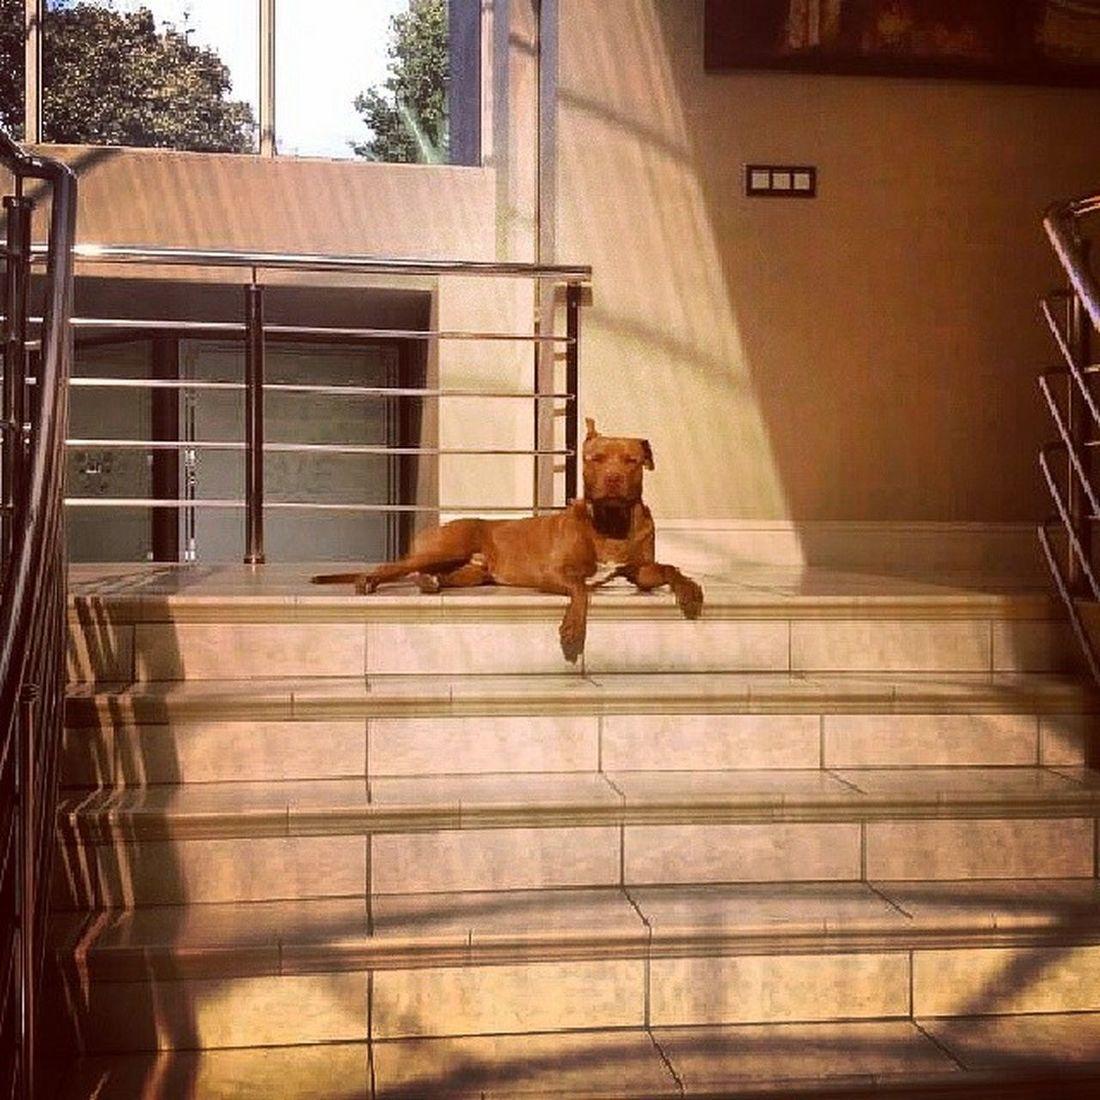 King Levi. Whosetheboss Pitbull Rednose  doyoueven dog???:/